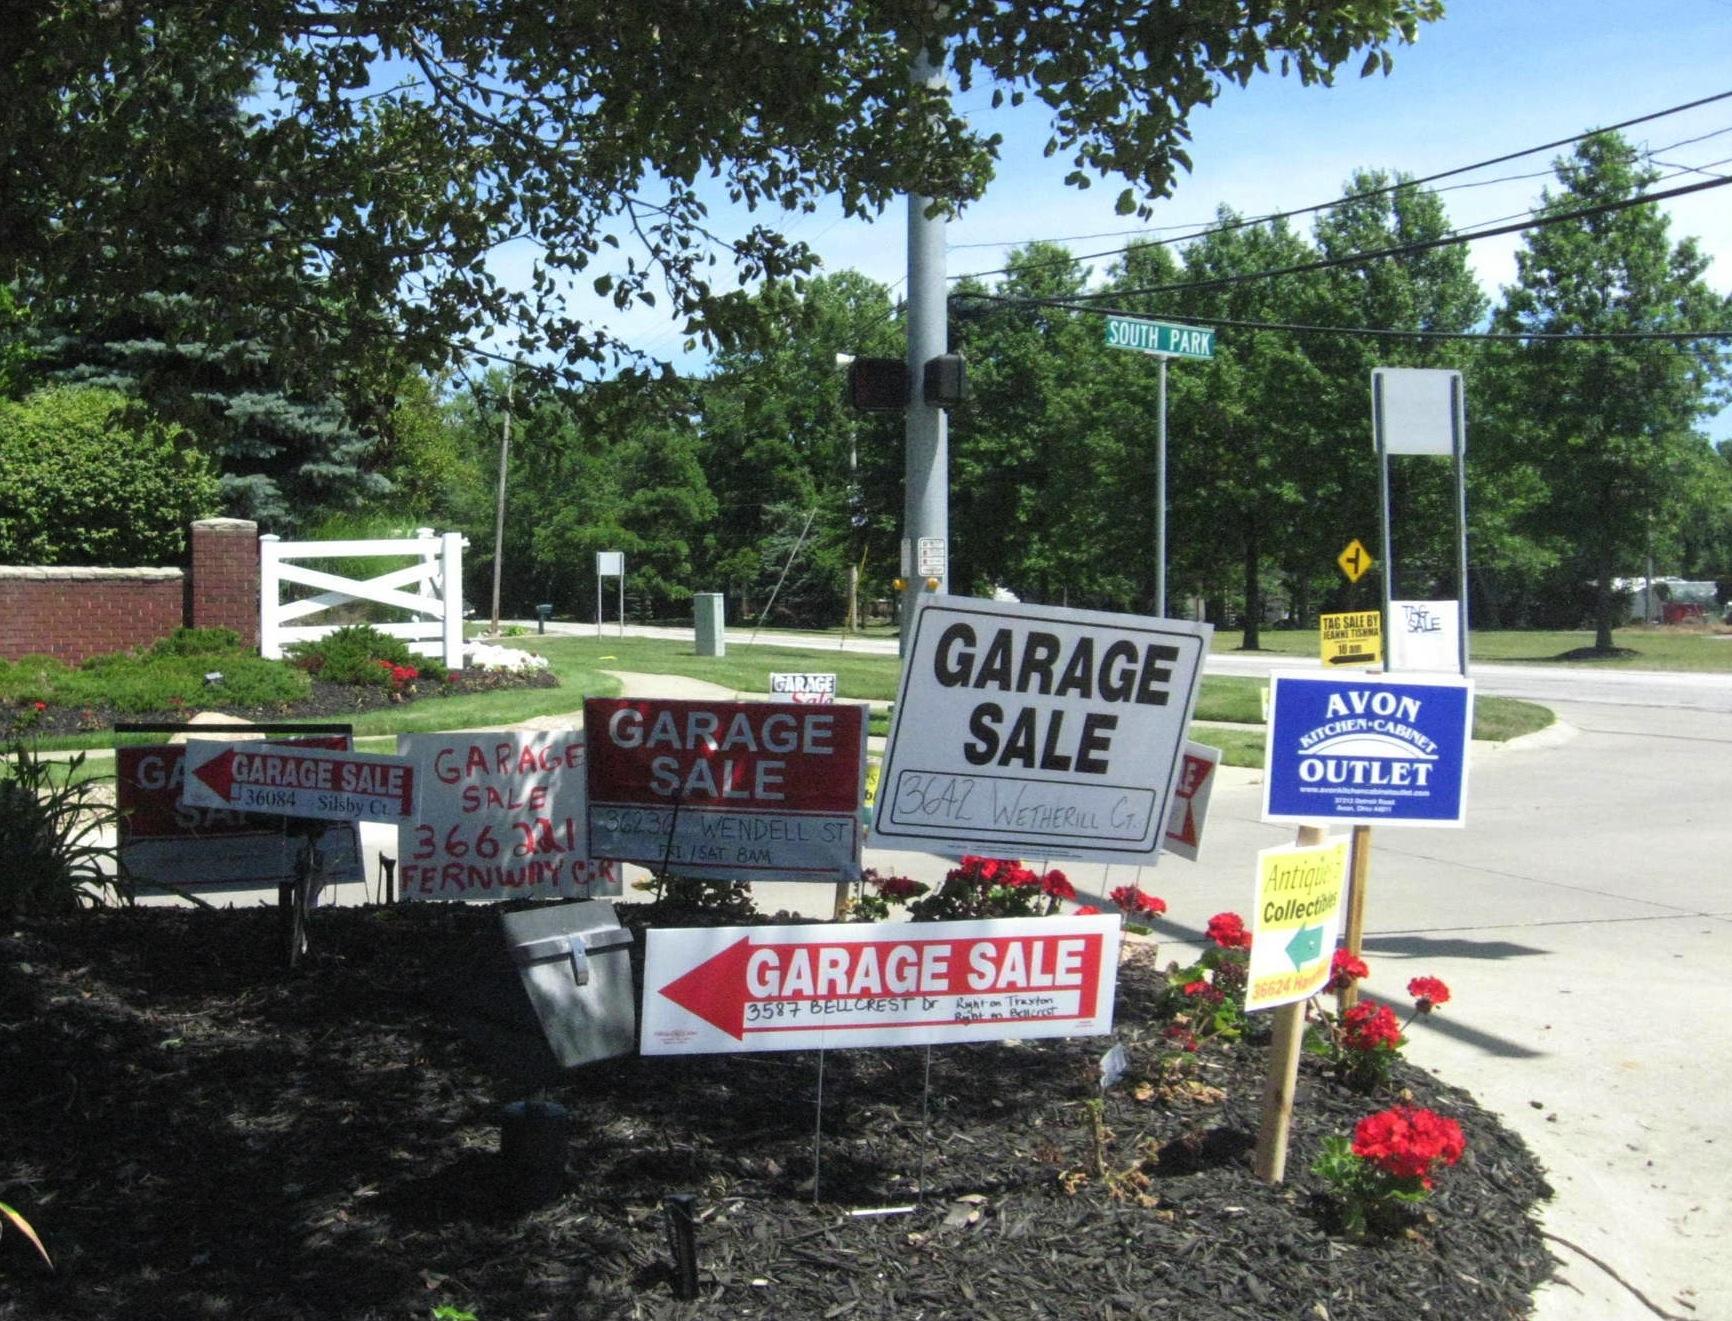 Houston Garage Sales: Search sales in Houston, TX